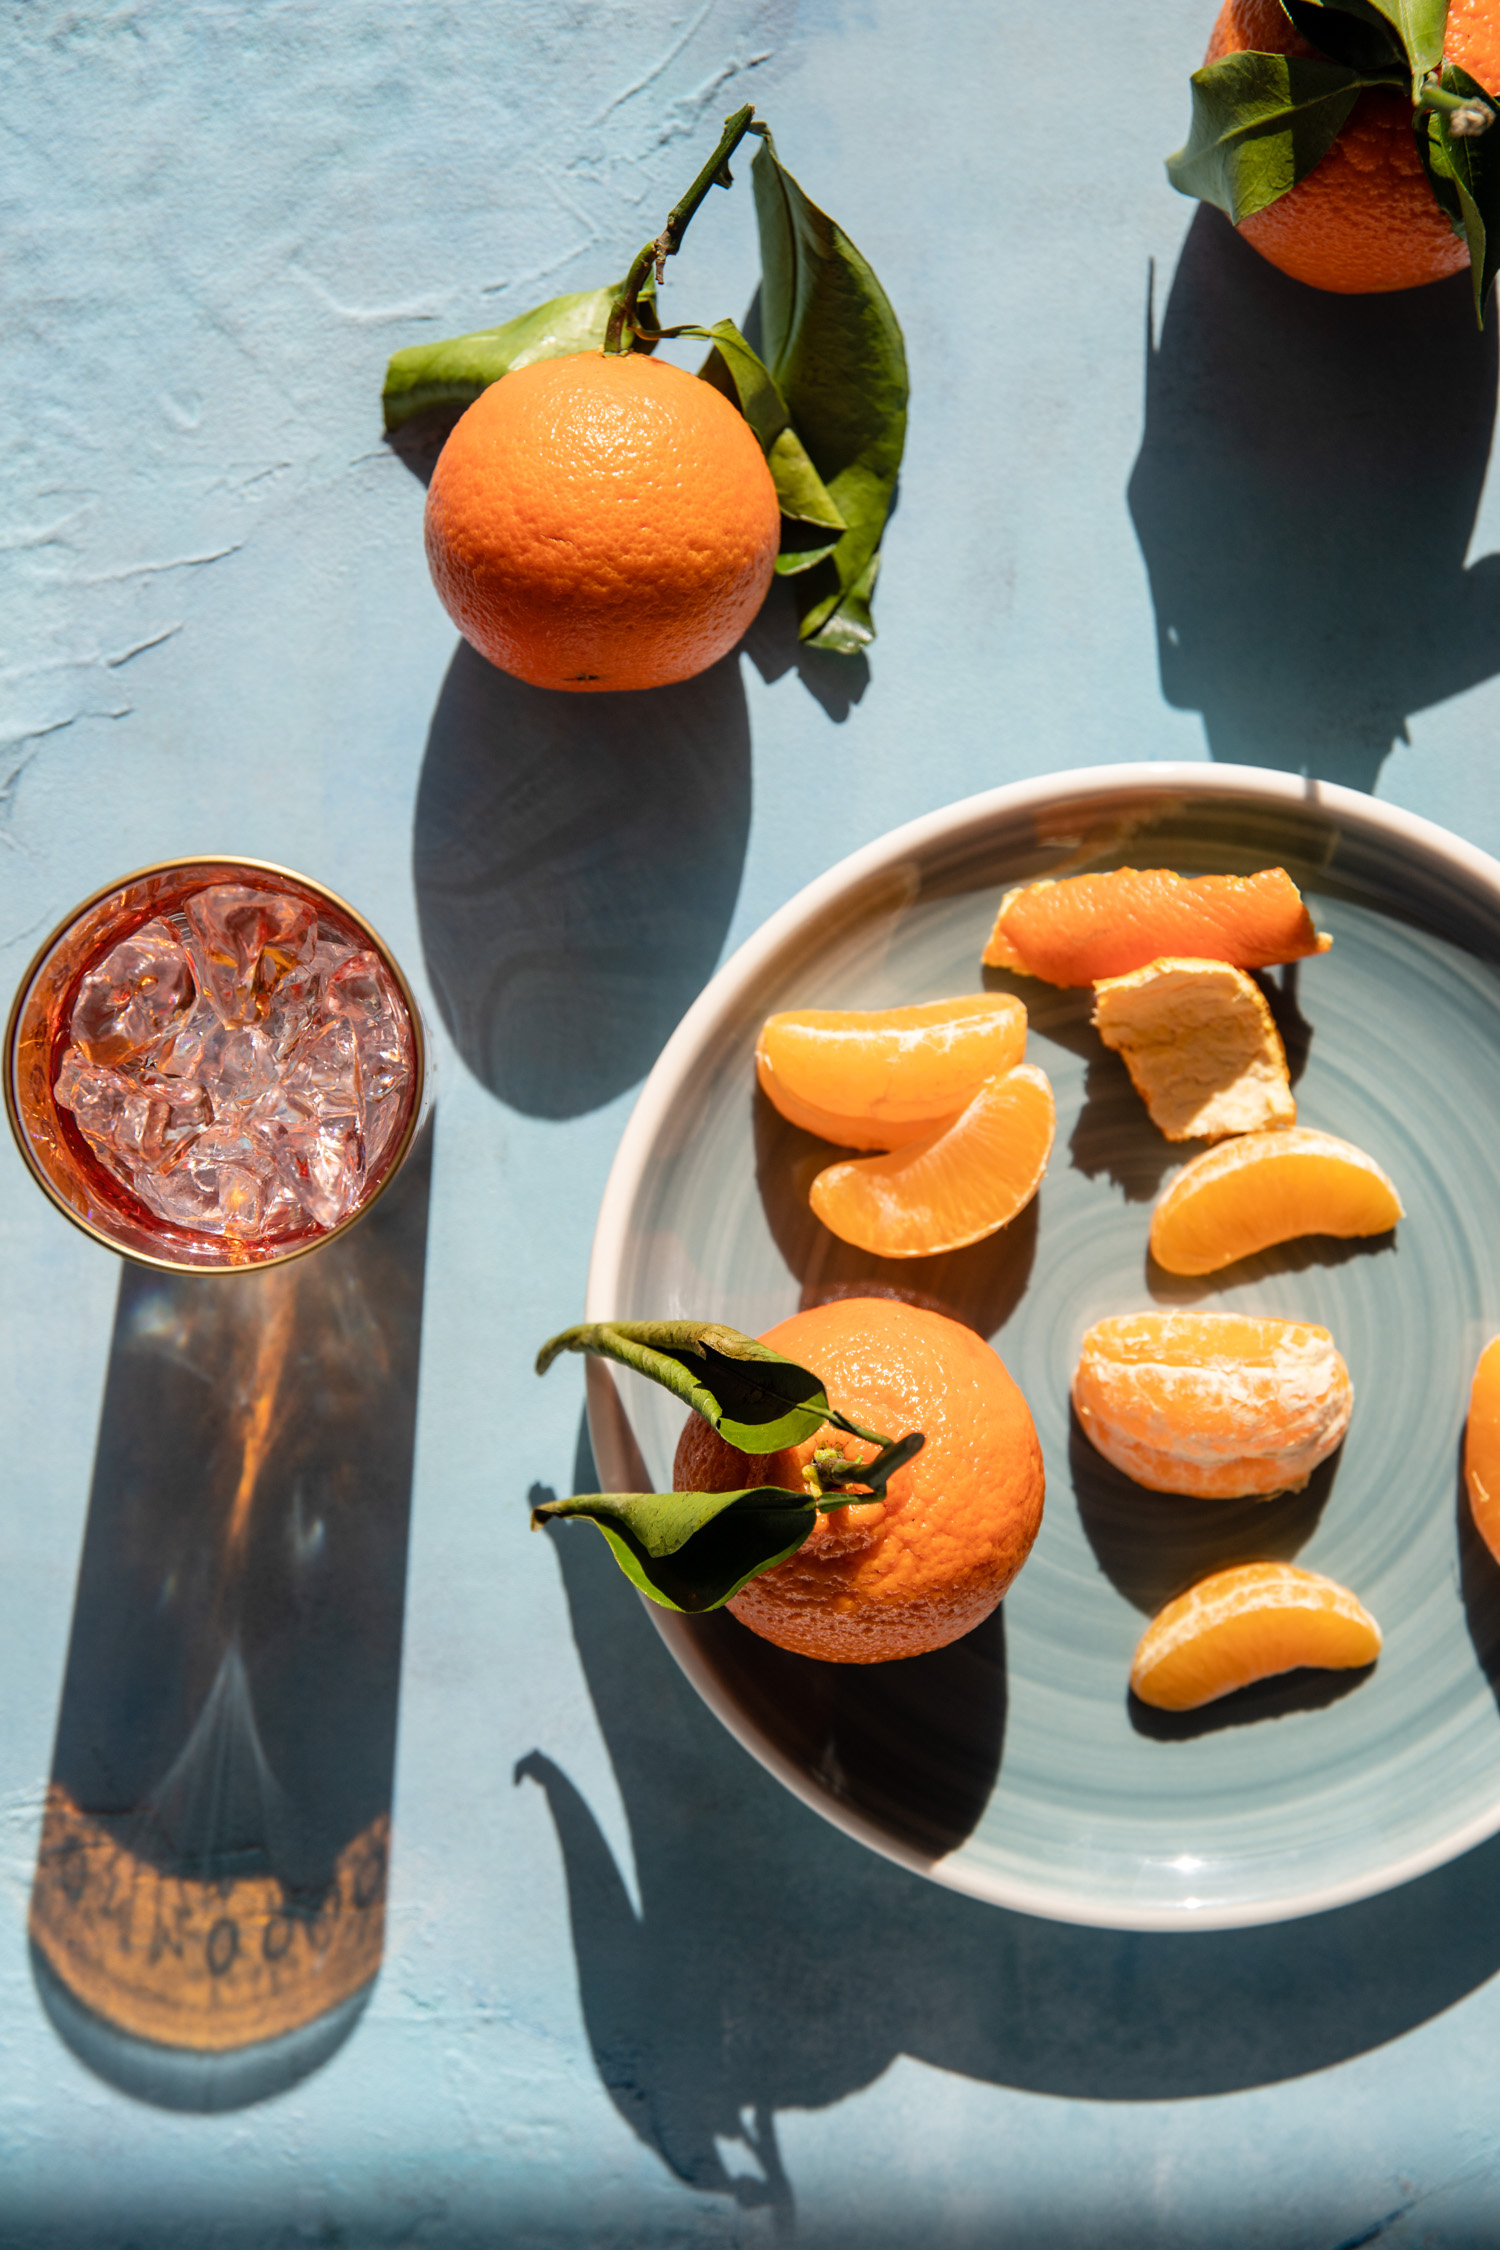 Copy of Still Life with Mandarins